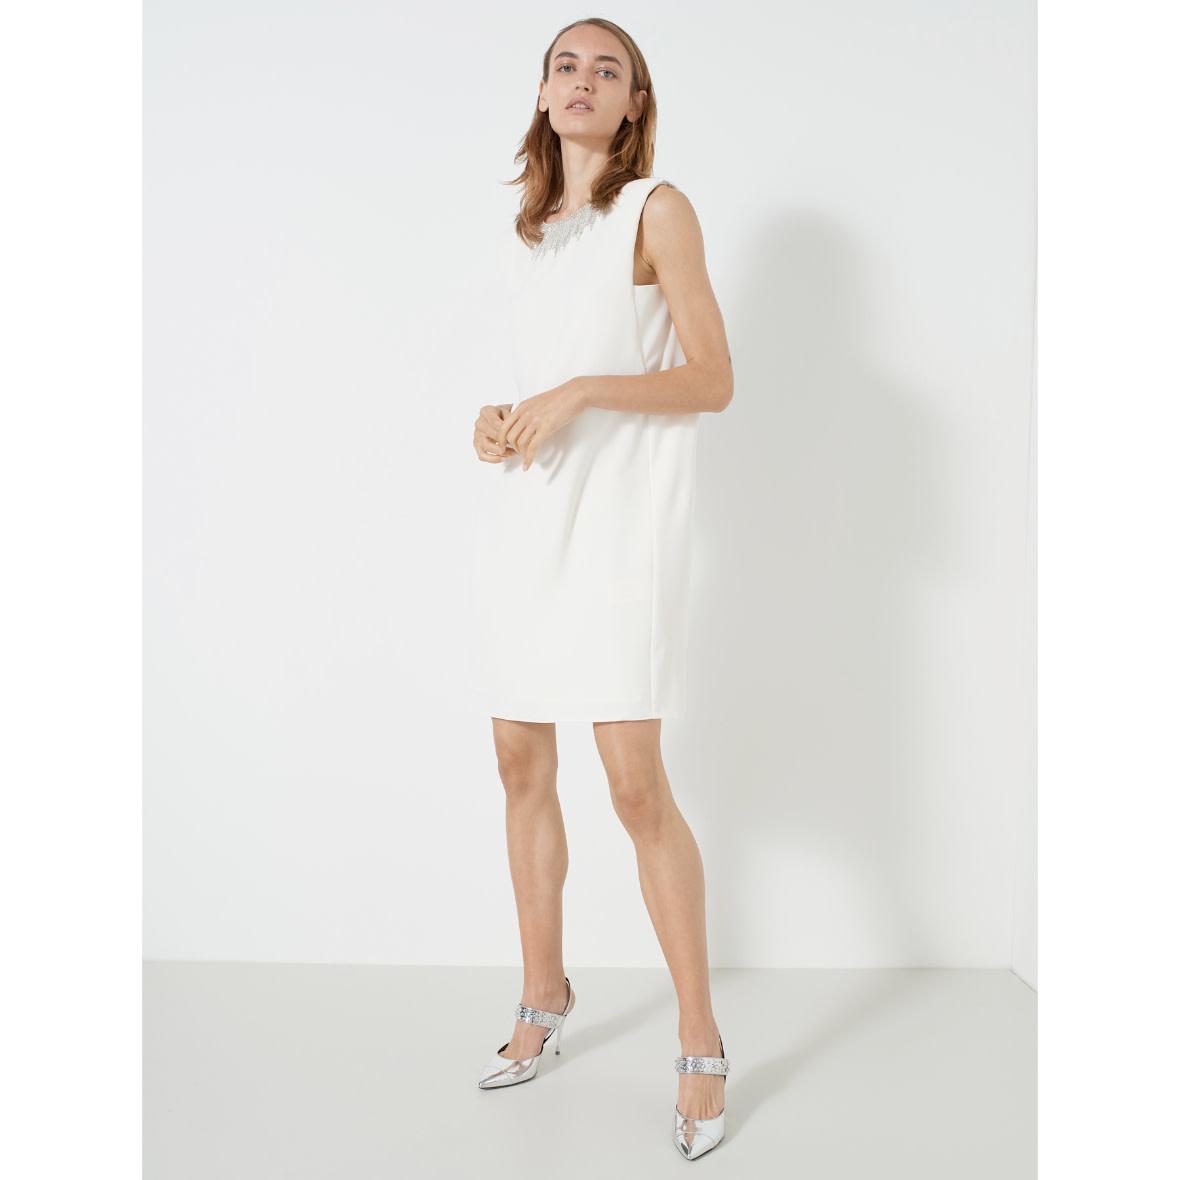 Marella Marella Fulvia Dress